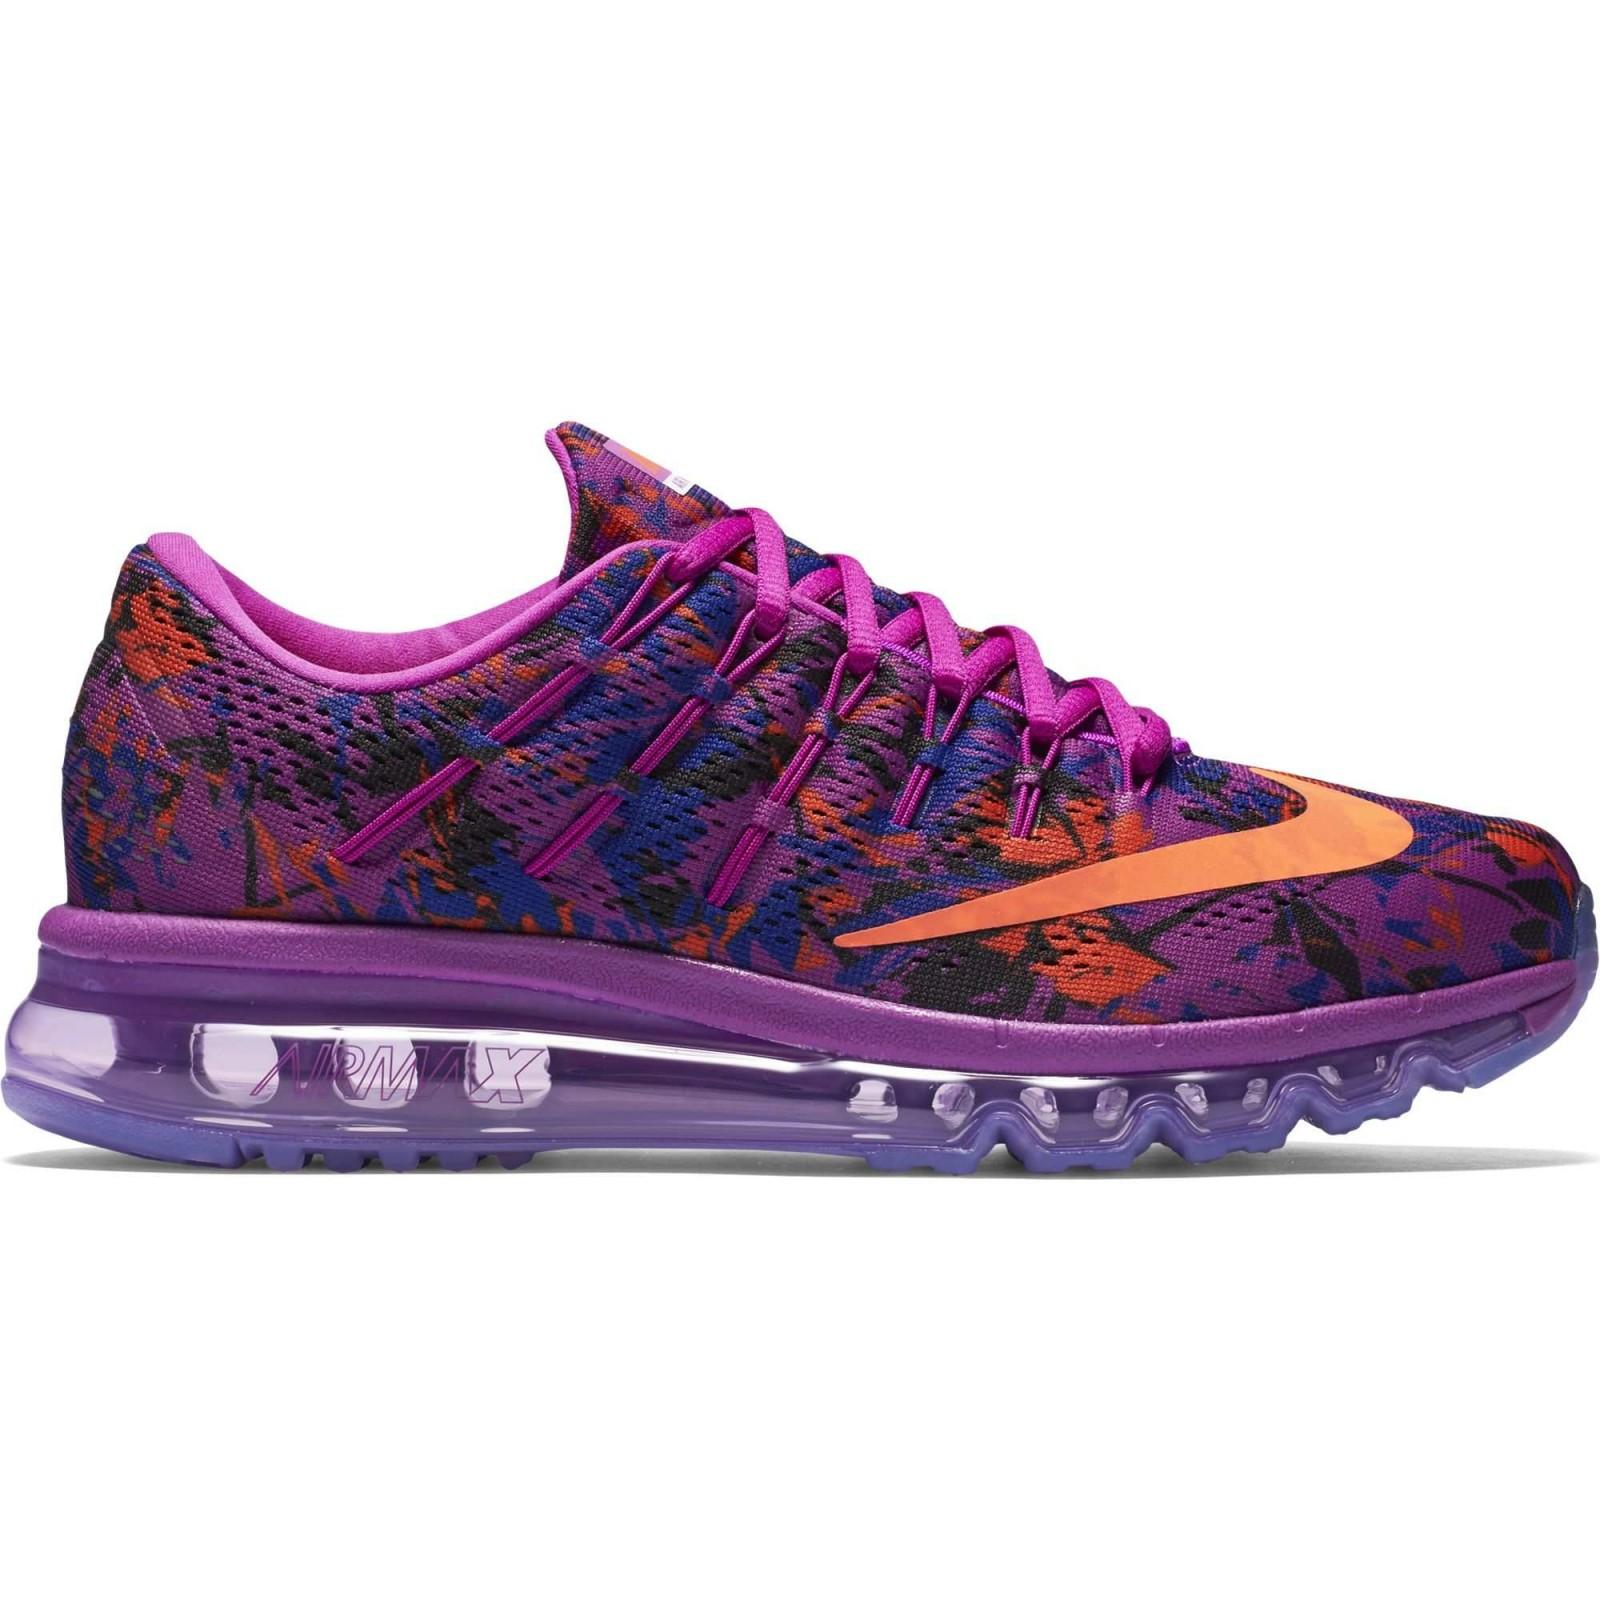 b5403c5ee0e Dámské boty Nike WMNS AIR MAX 2016 PRINT fialové